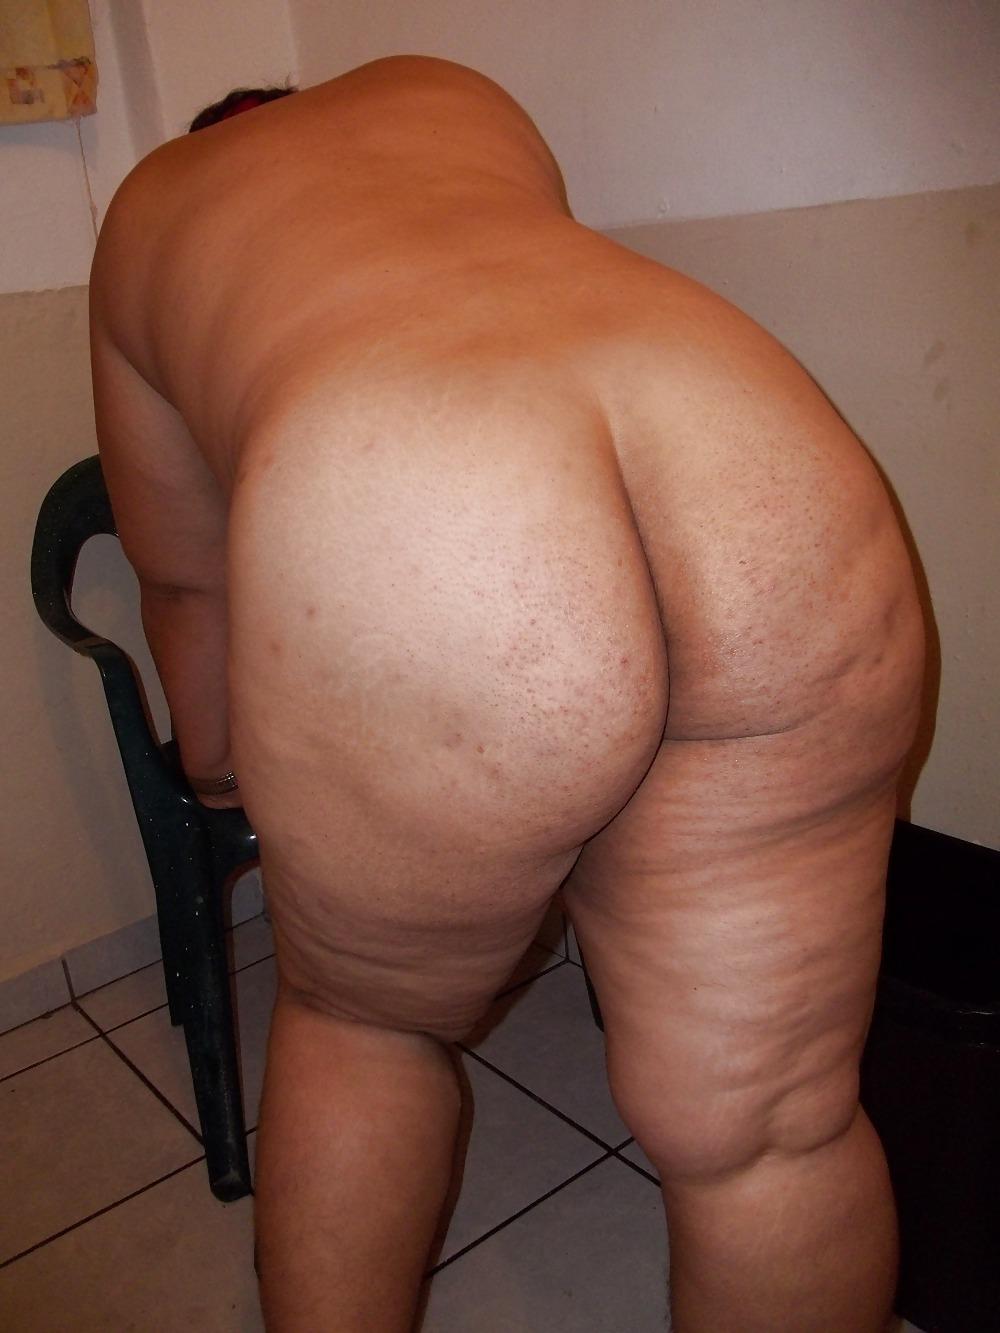 bbw-mexican-isabel-nude-stills-videos